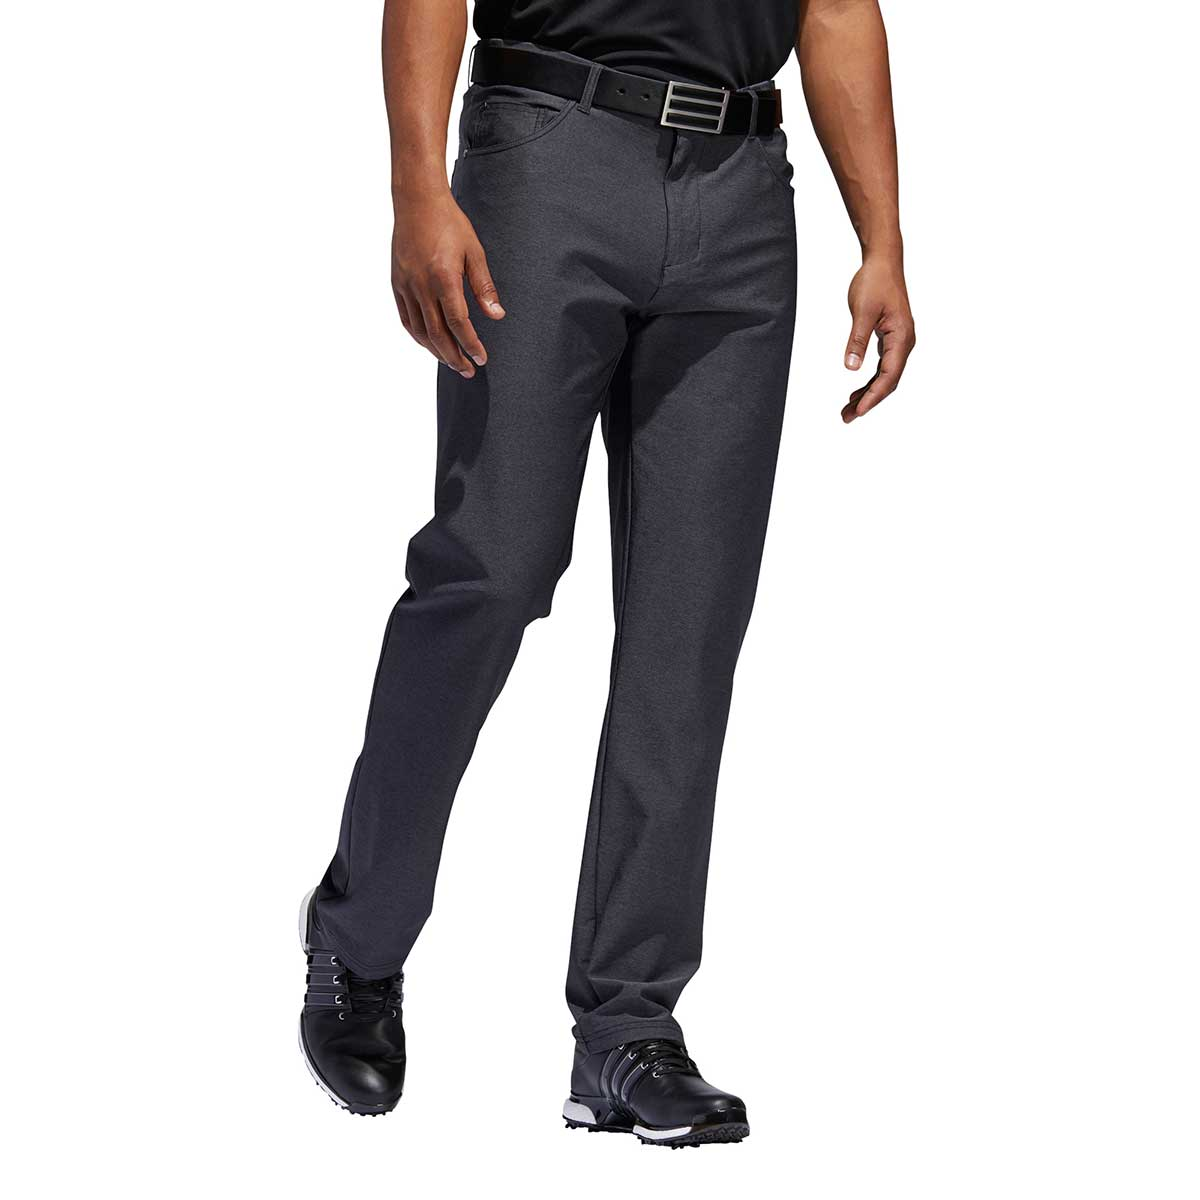 Adidas Men's Ultimate365 Heathered Five-Pocket Black Heather Pants